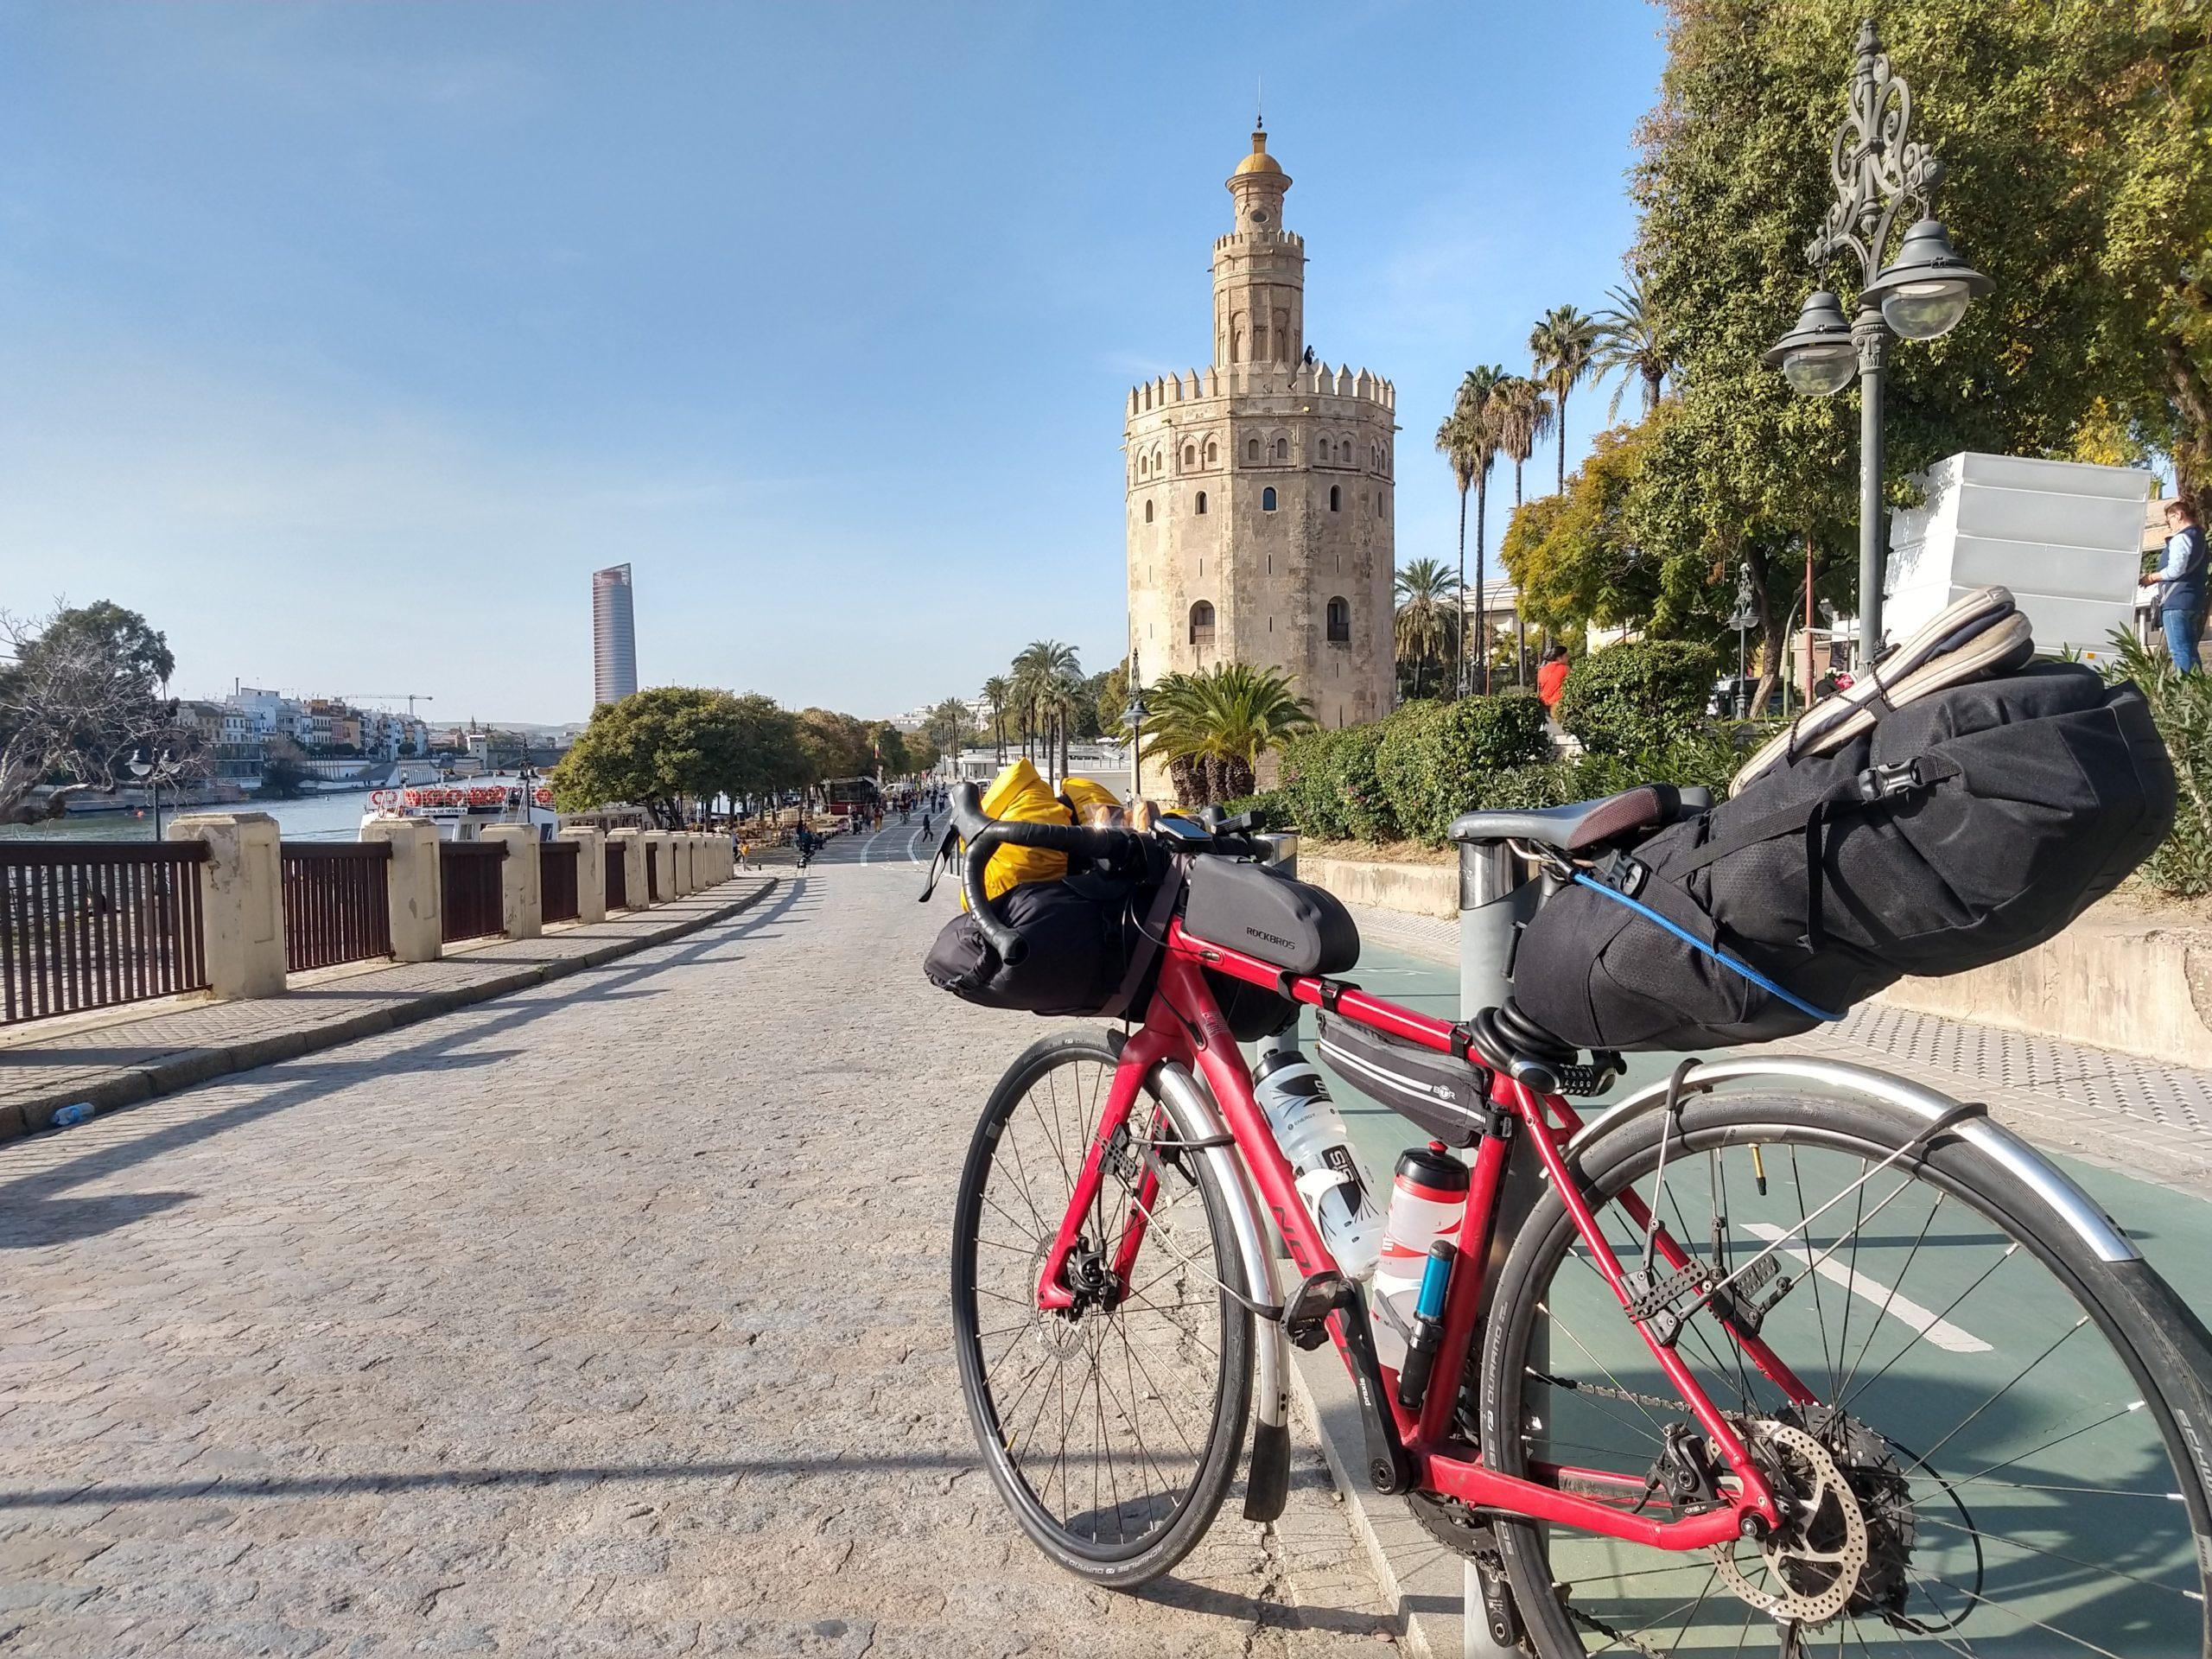 Bikepacking the length of Spain